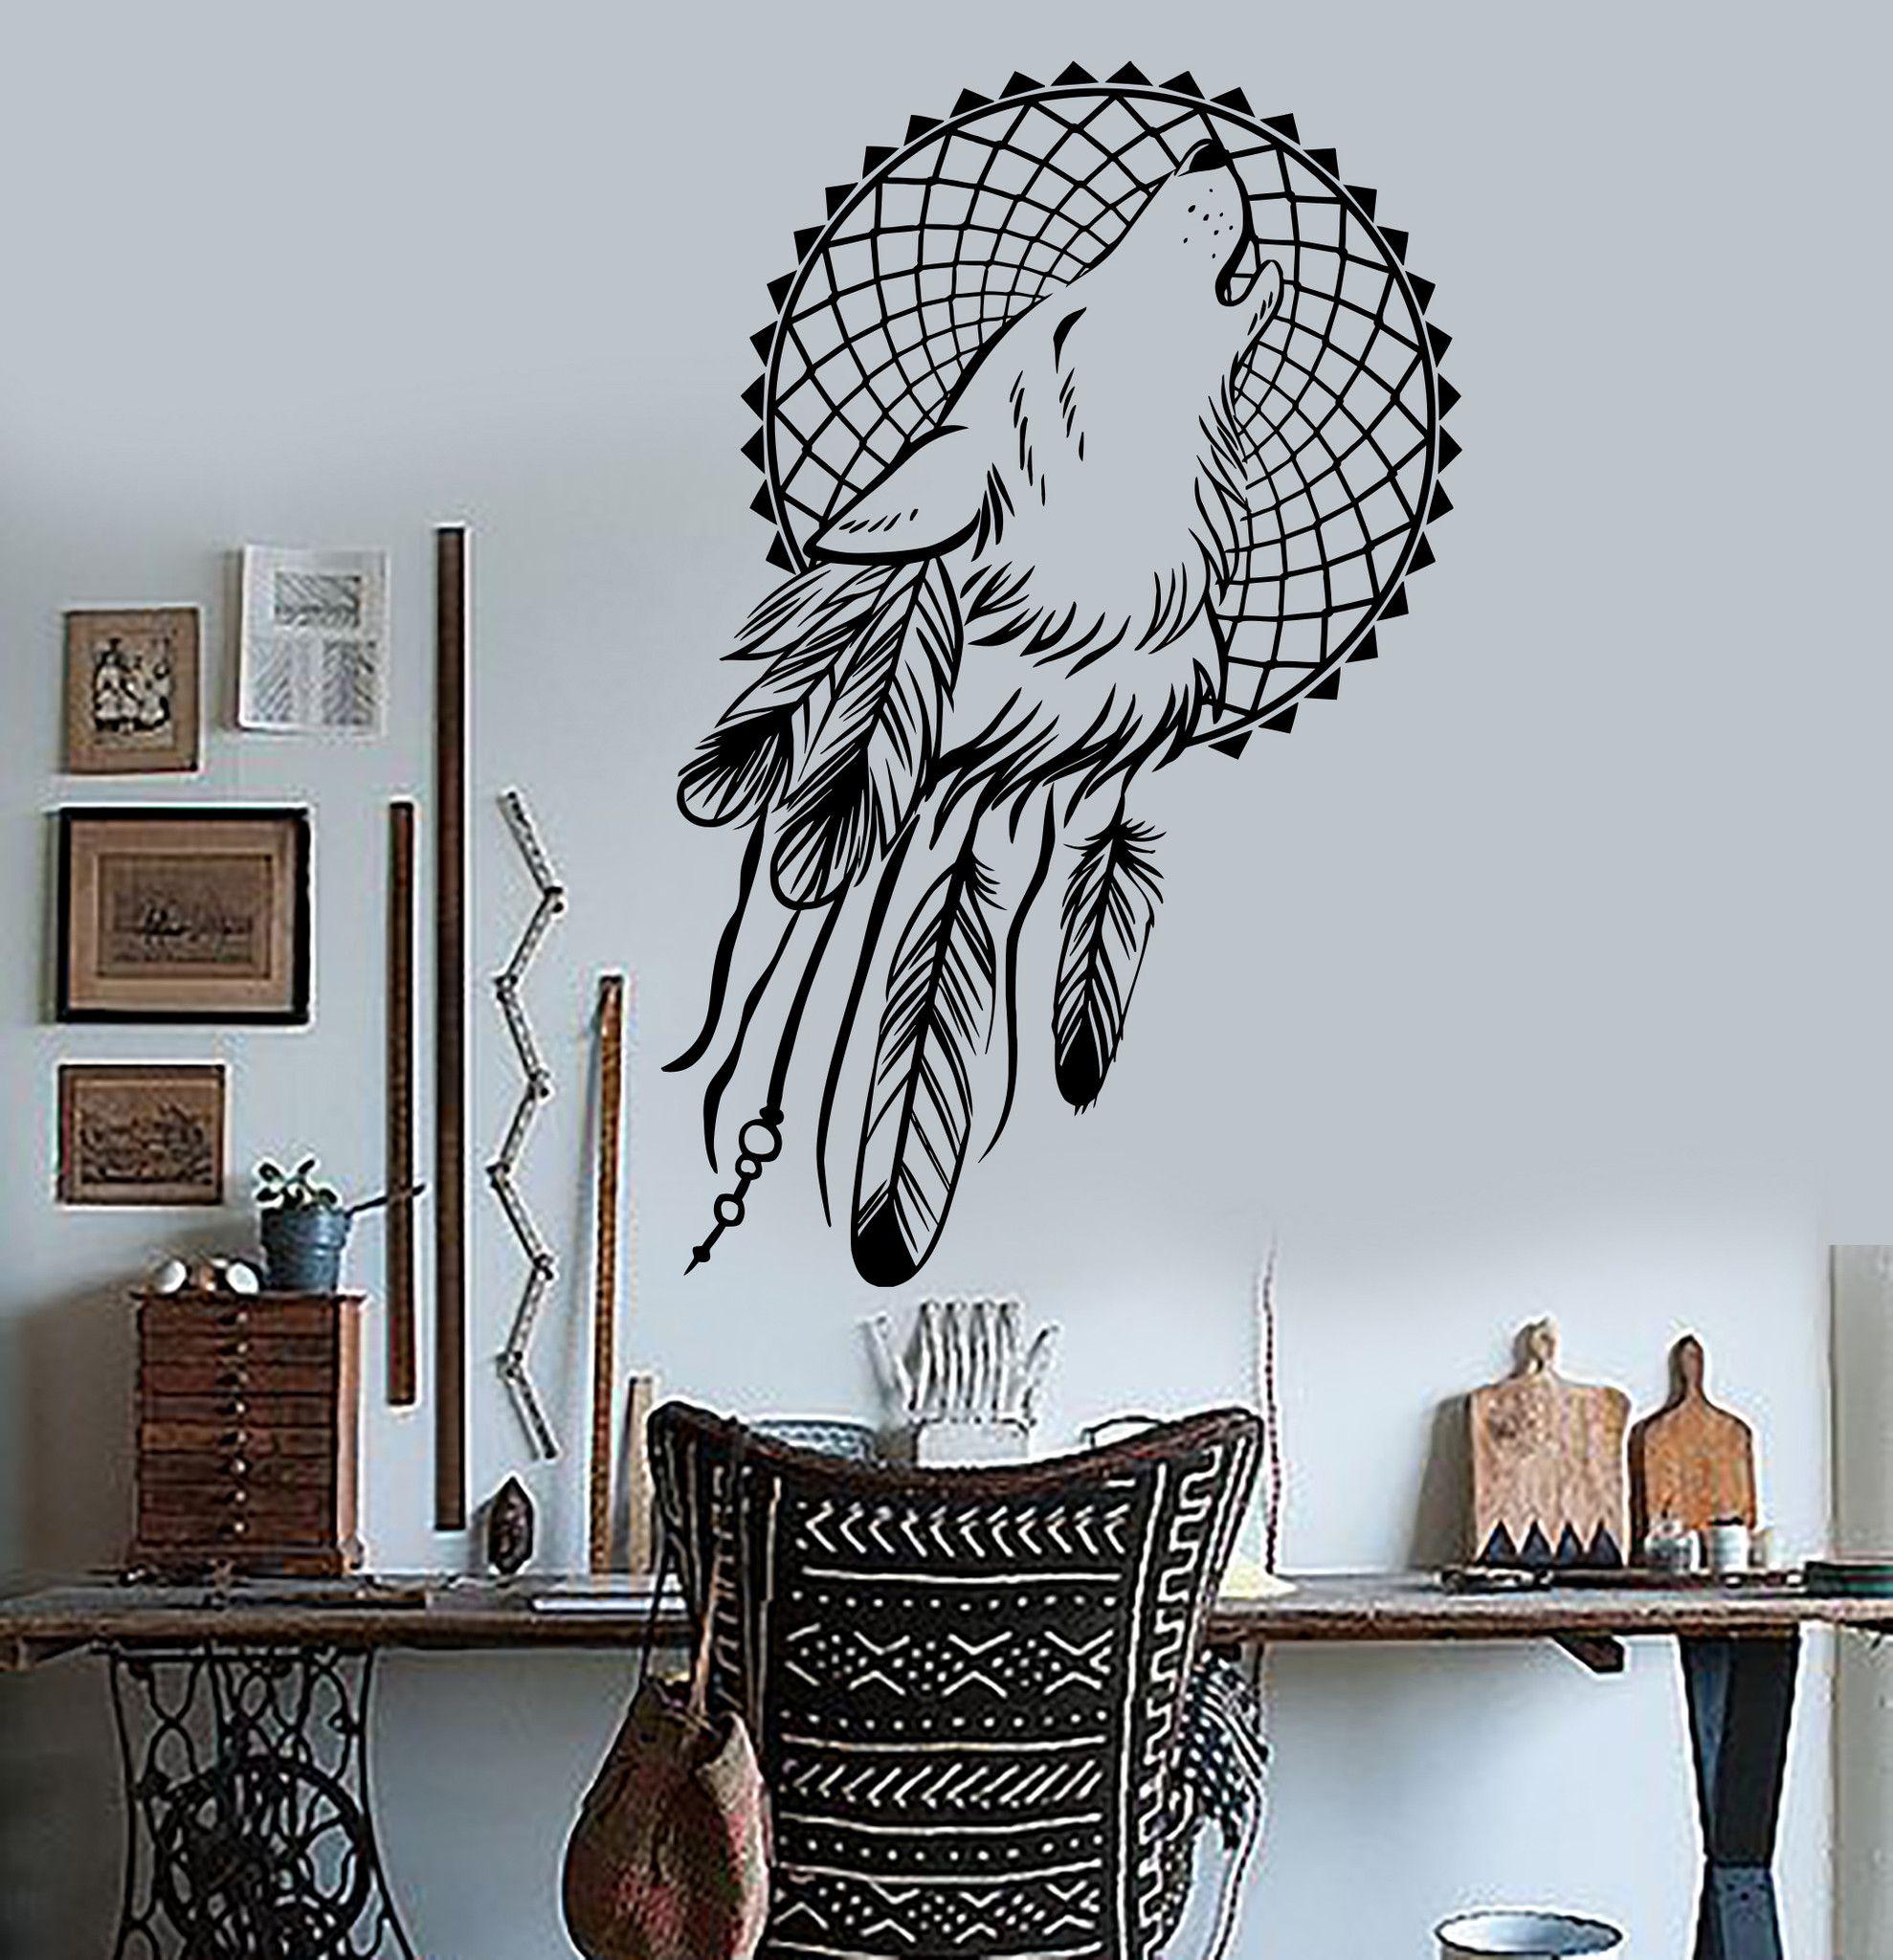 Vinyl Wall Decals Dream Catcher Wolf Bedroom Dreamcatcher Ethnic - Where to get vinyl stickers made